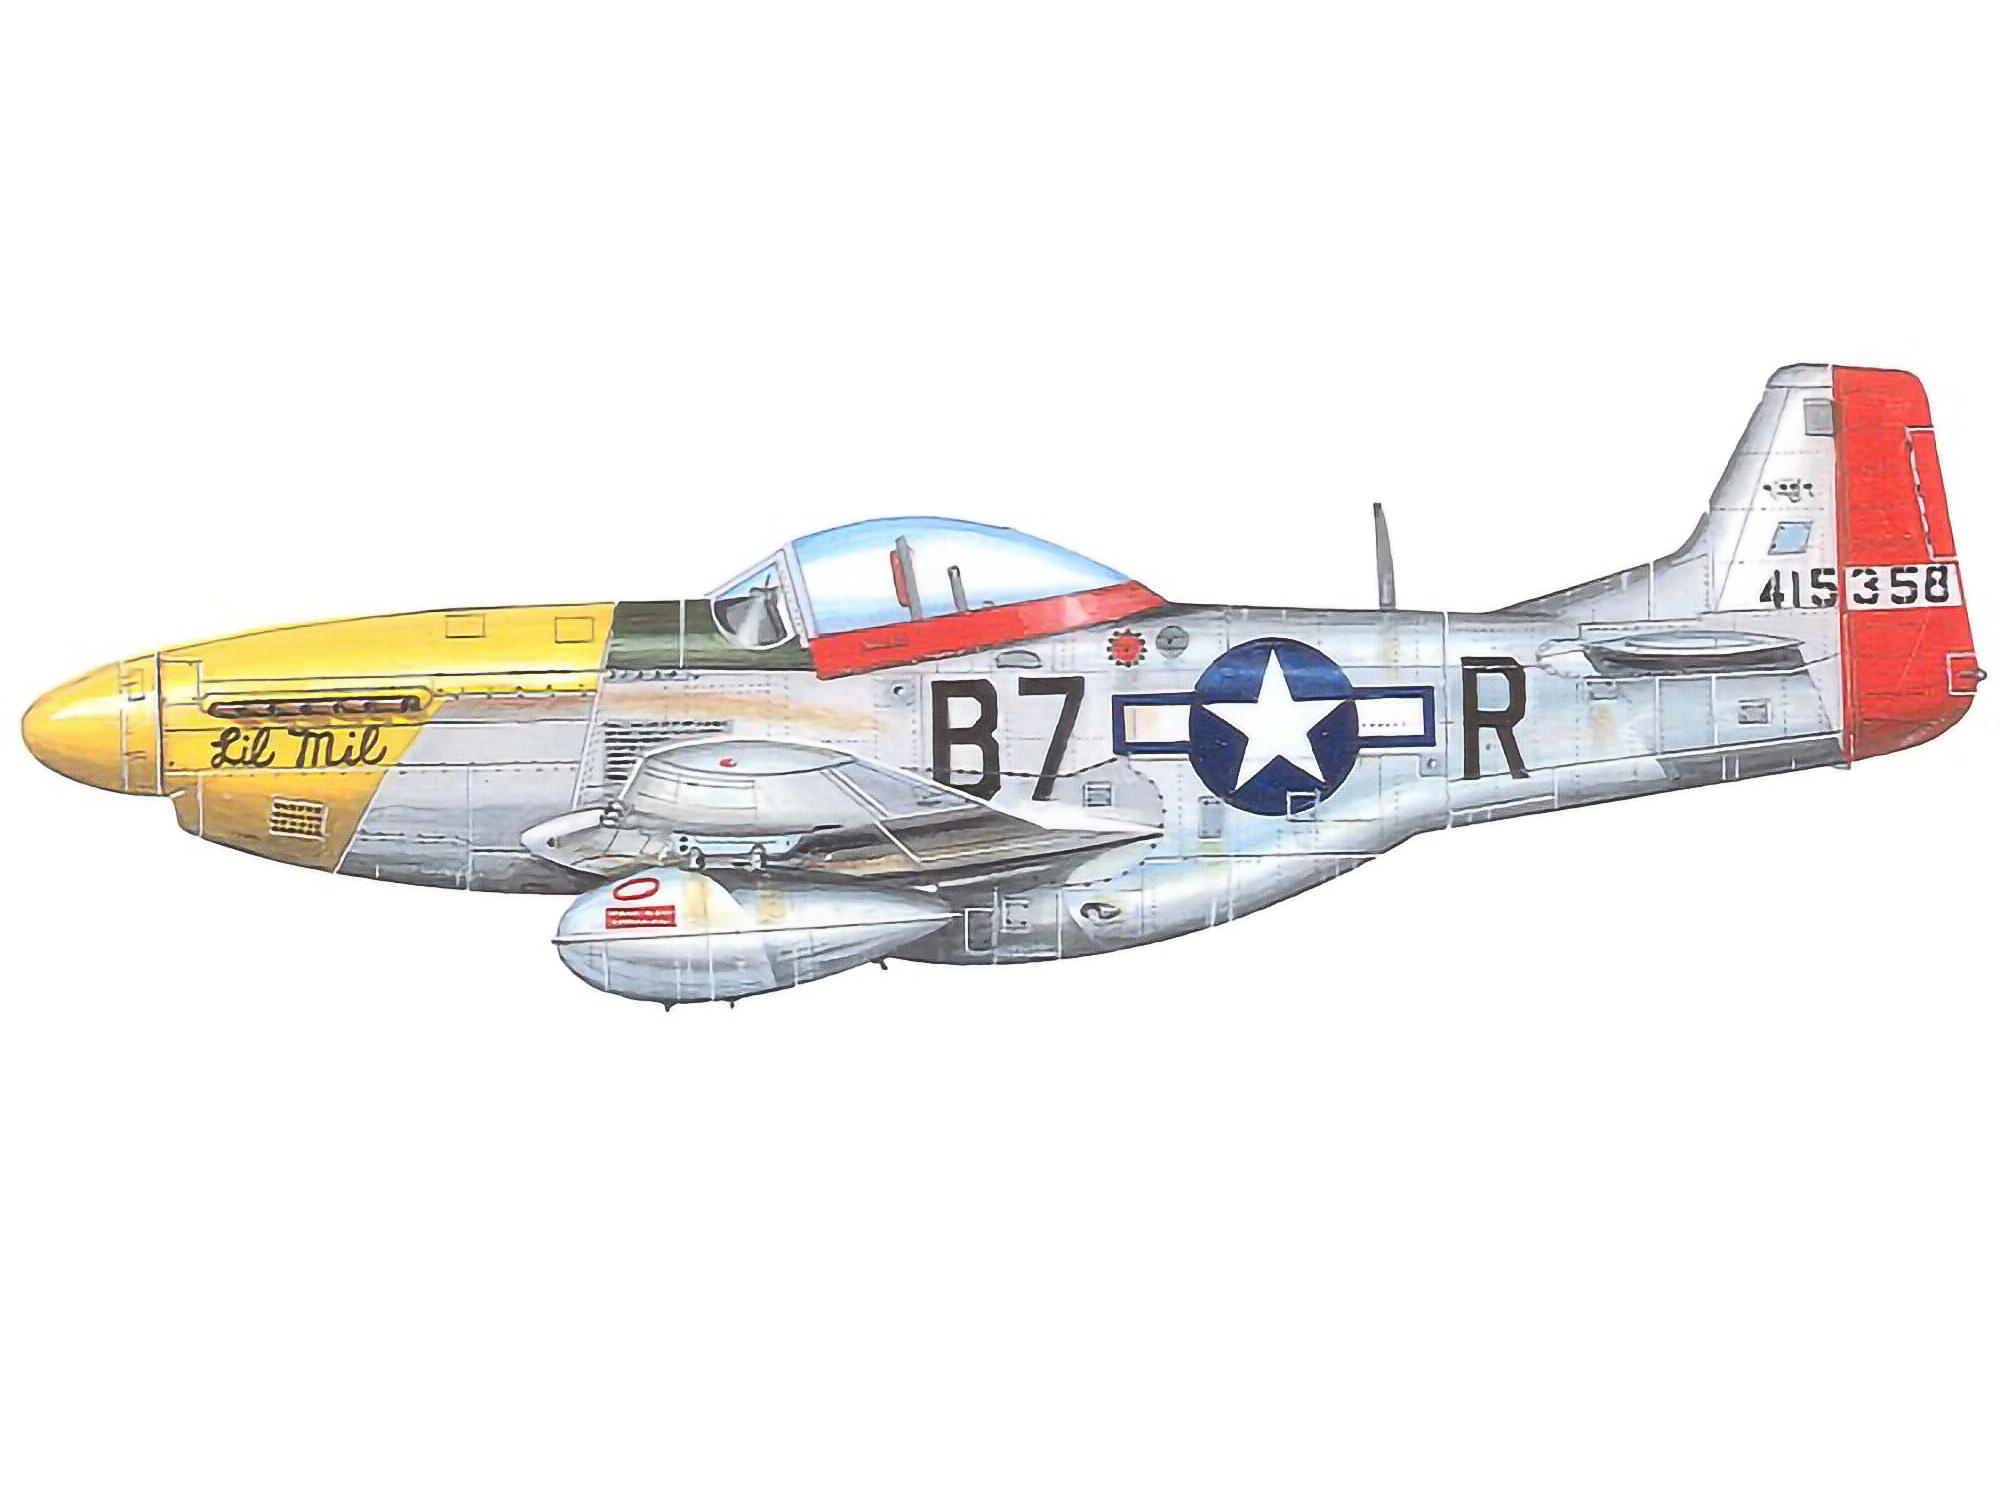 P-51D – Lil Mil – 44-15358